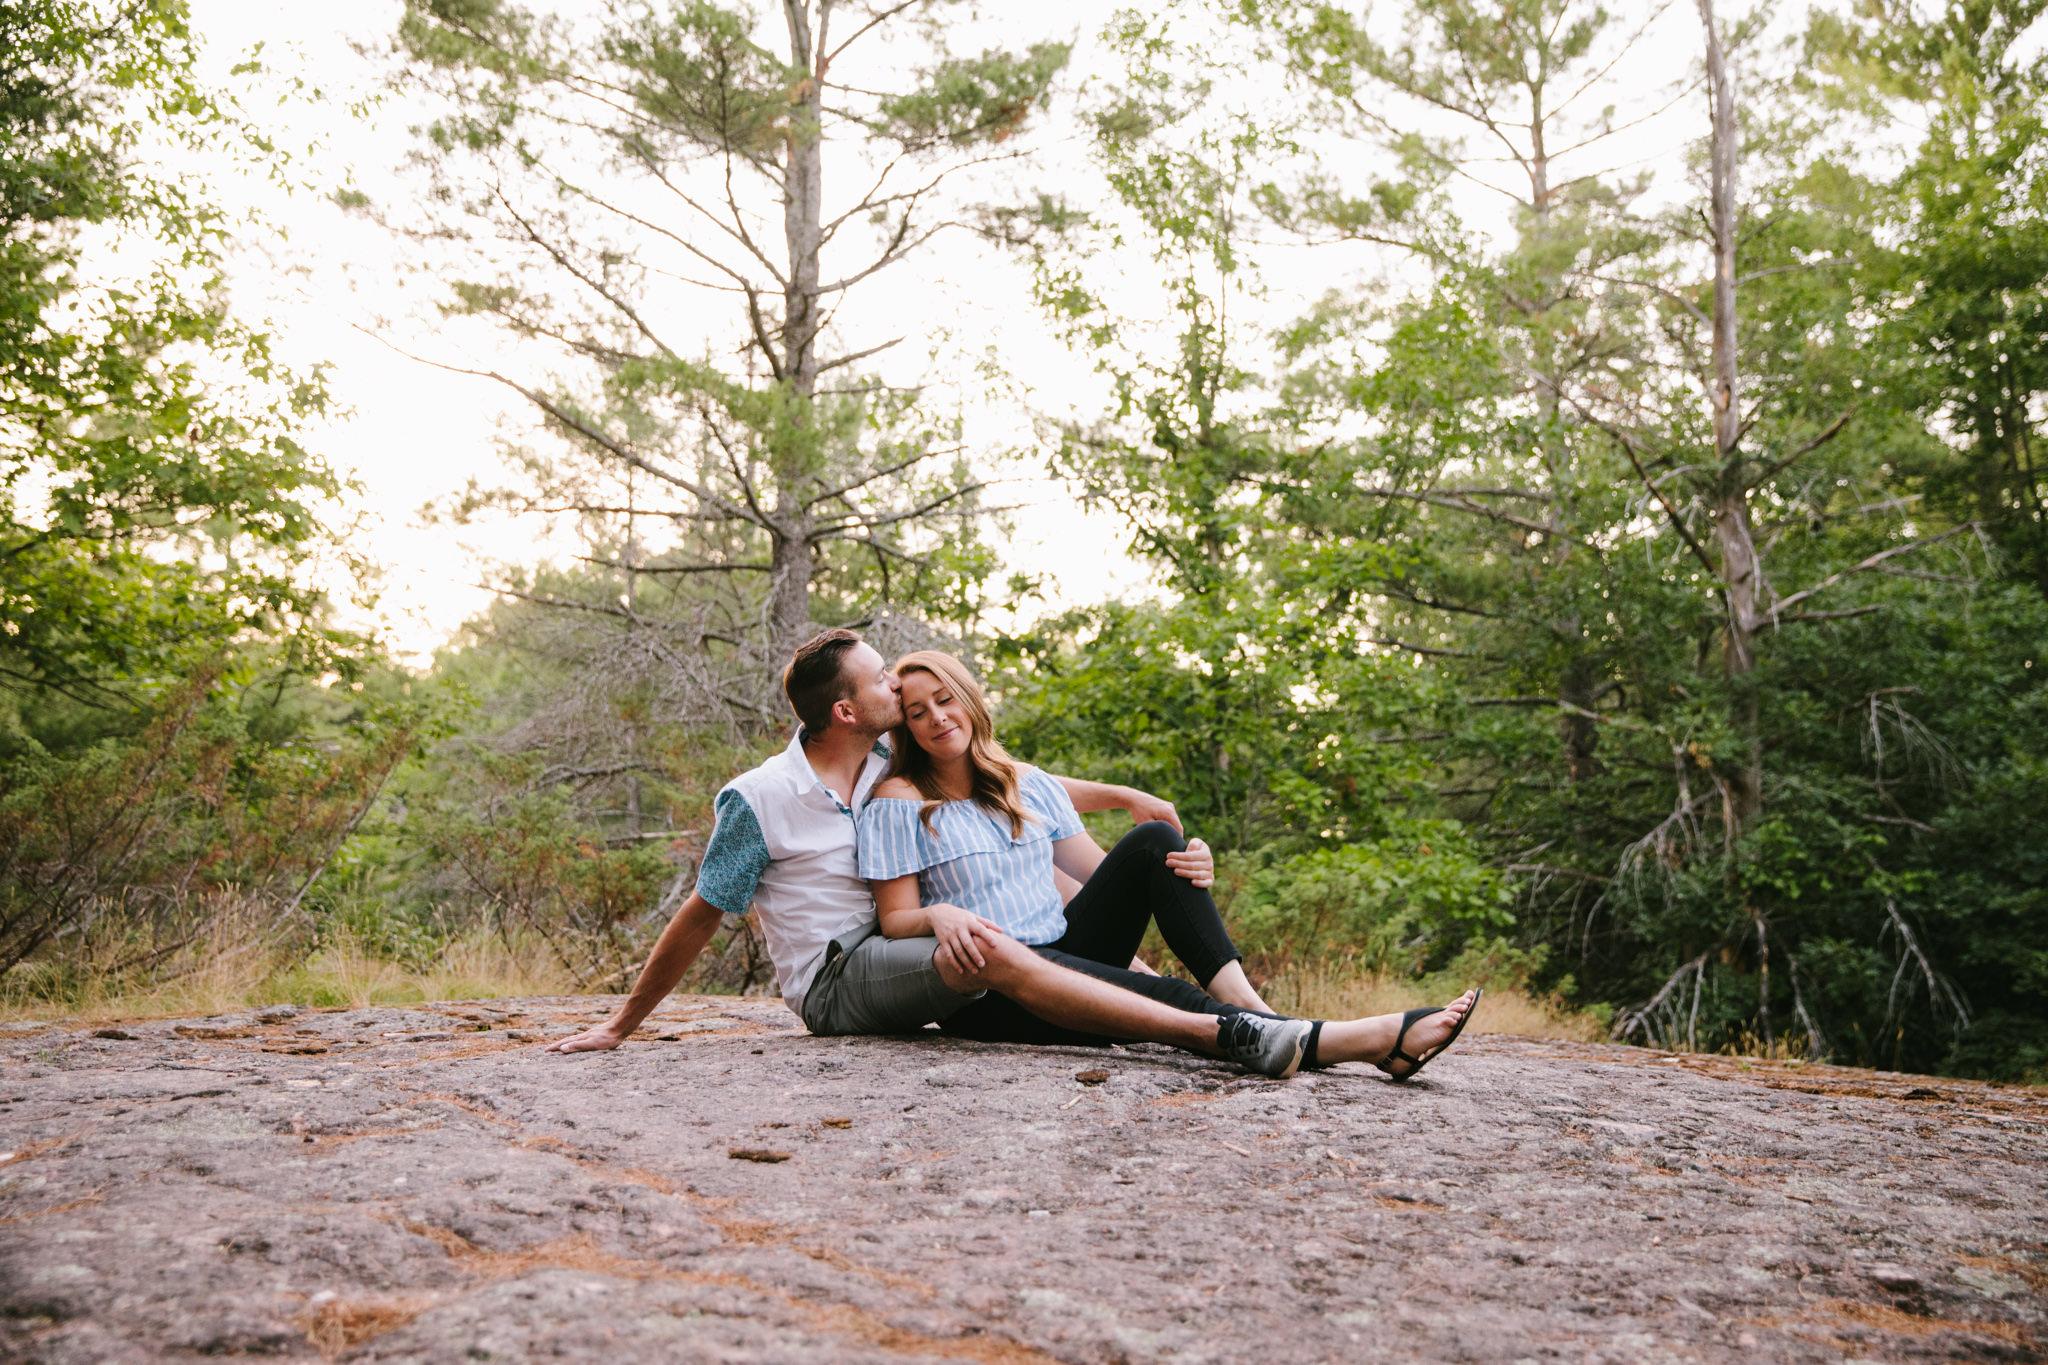 boy embracing girl while sitting on a rock called adam + eve buckhorn